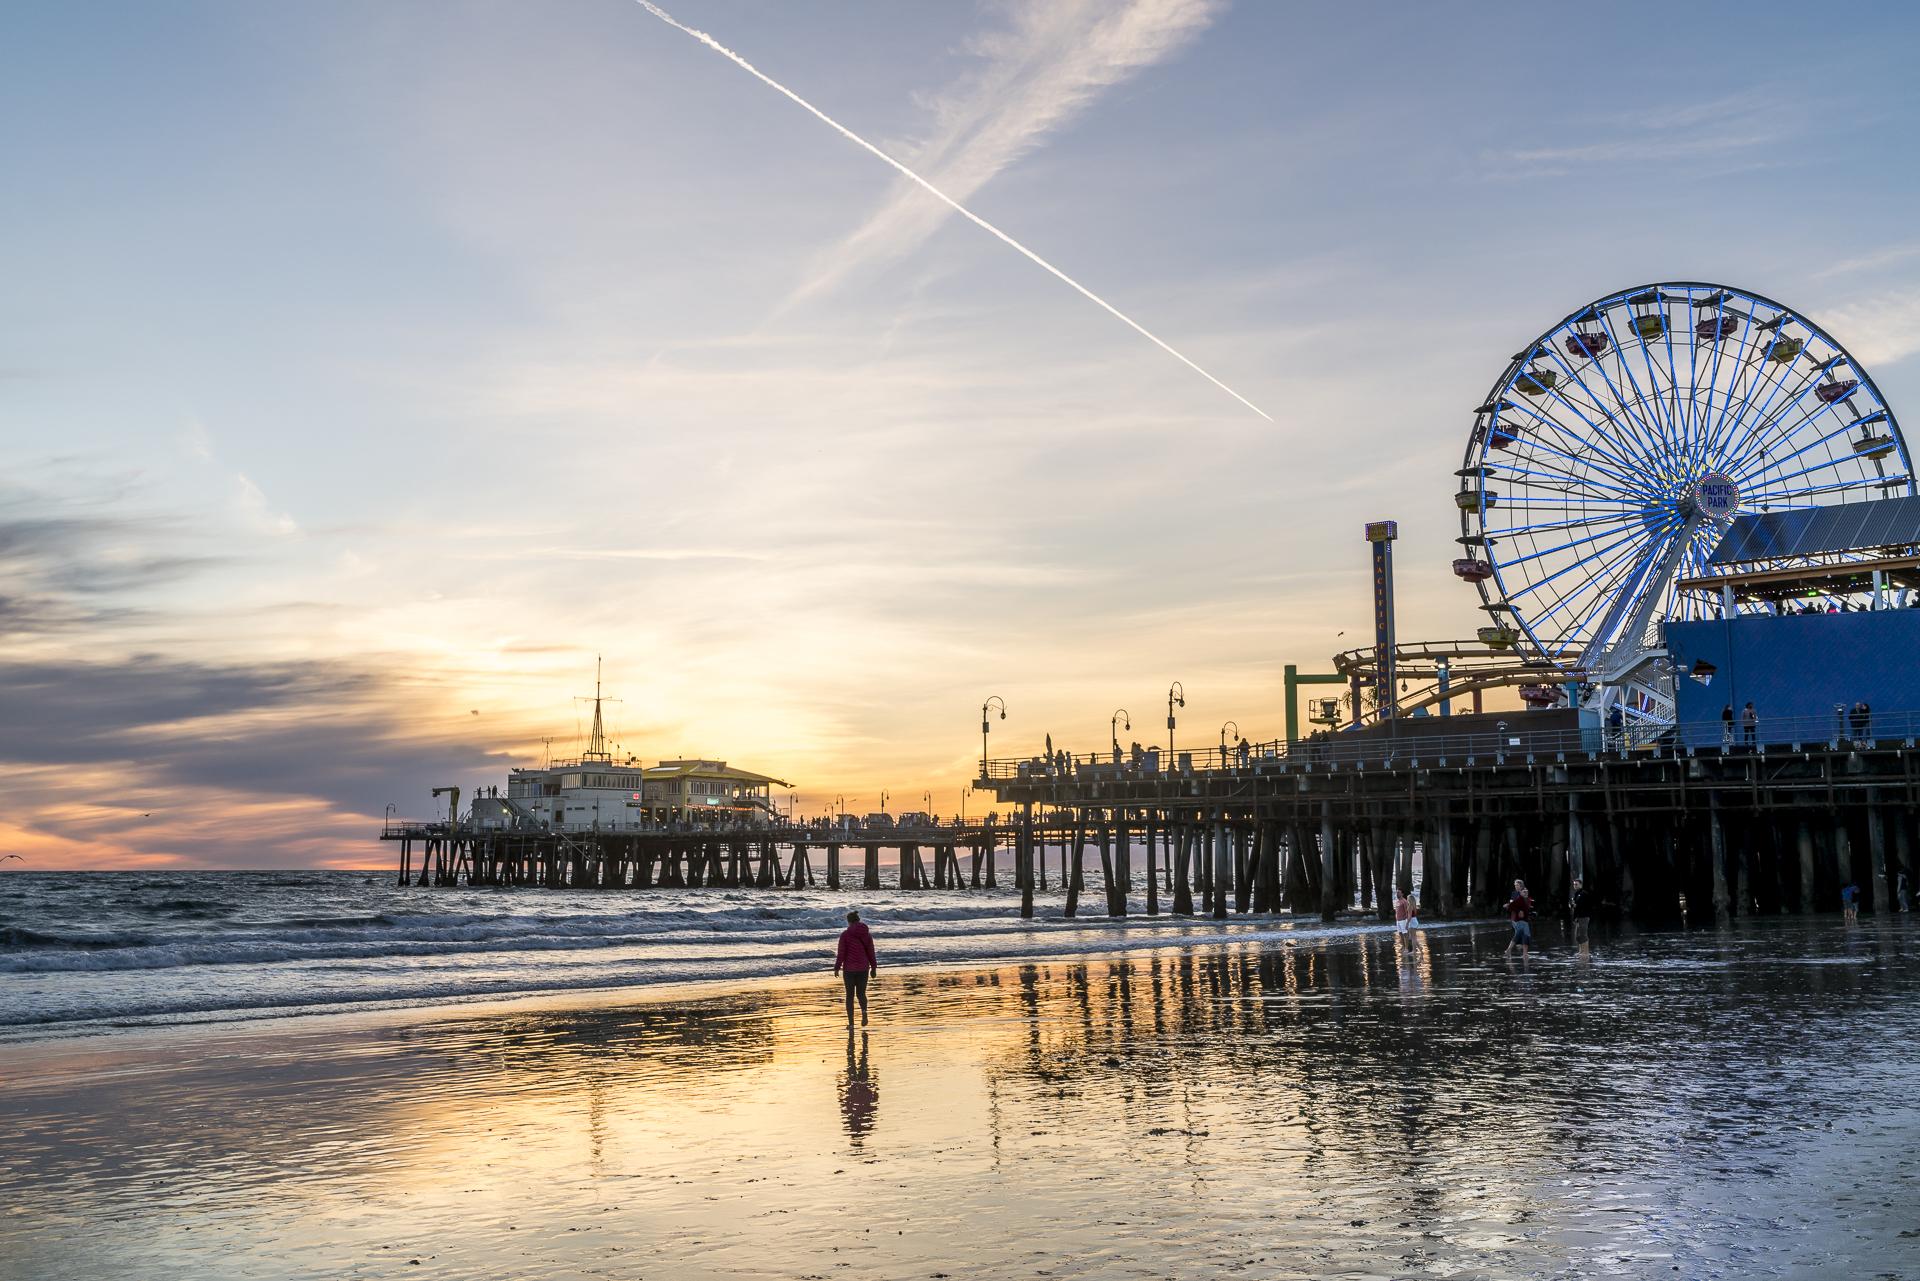 Santa Monica Kalifornien Sonnenuntergang